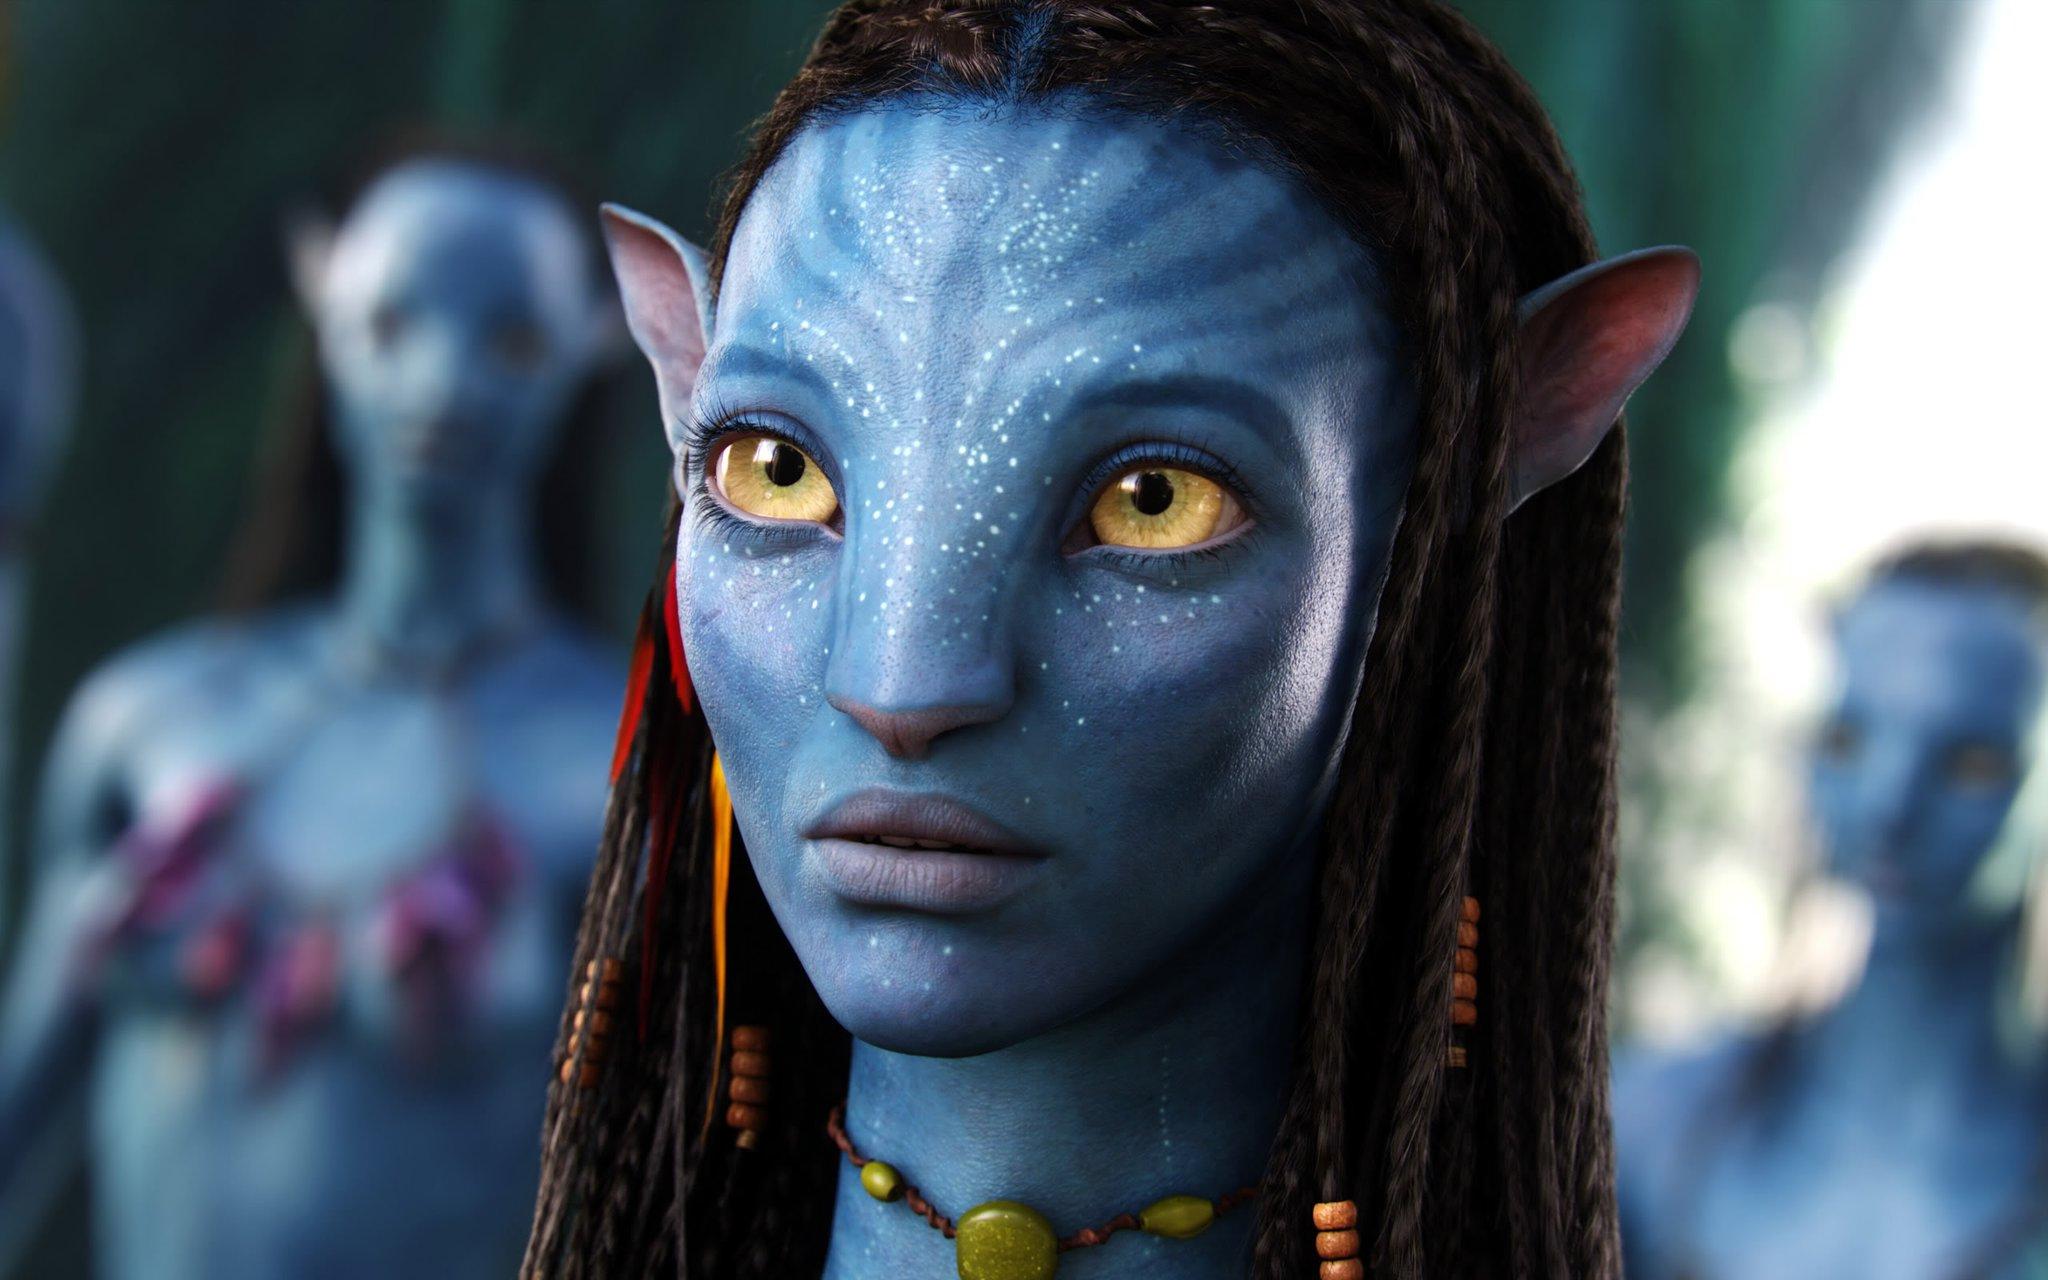 Картинки из кинофильма аватара